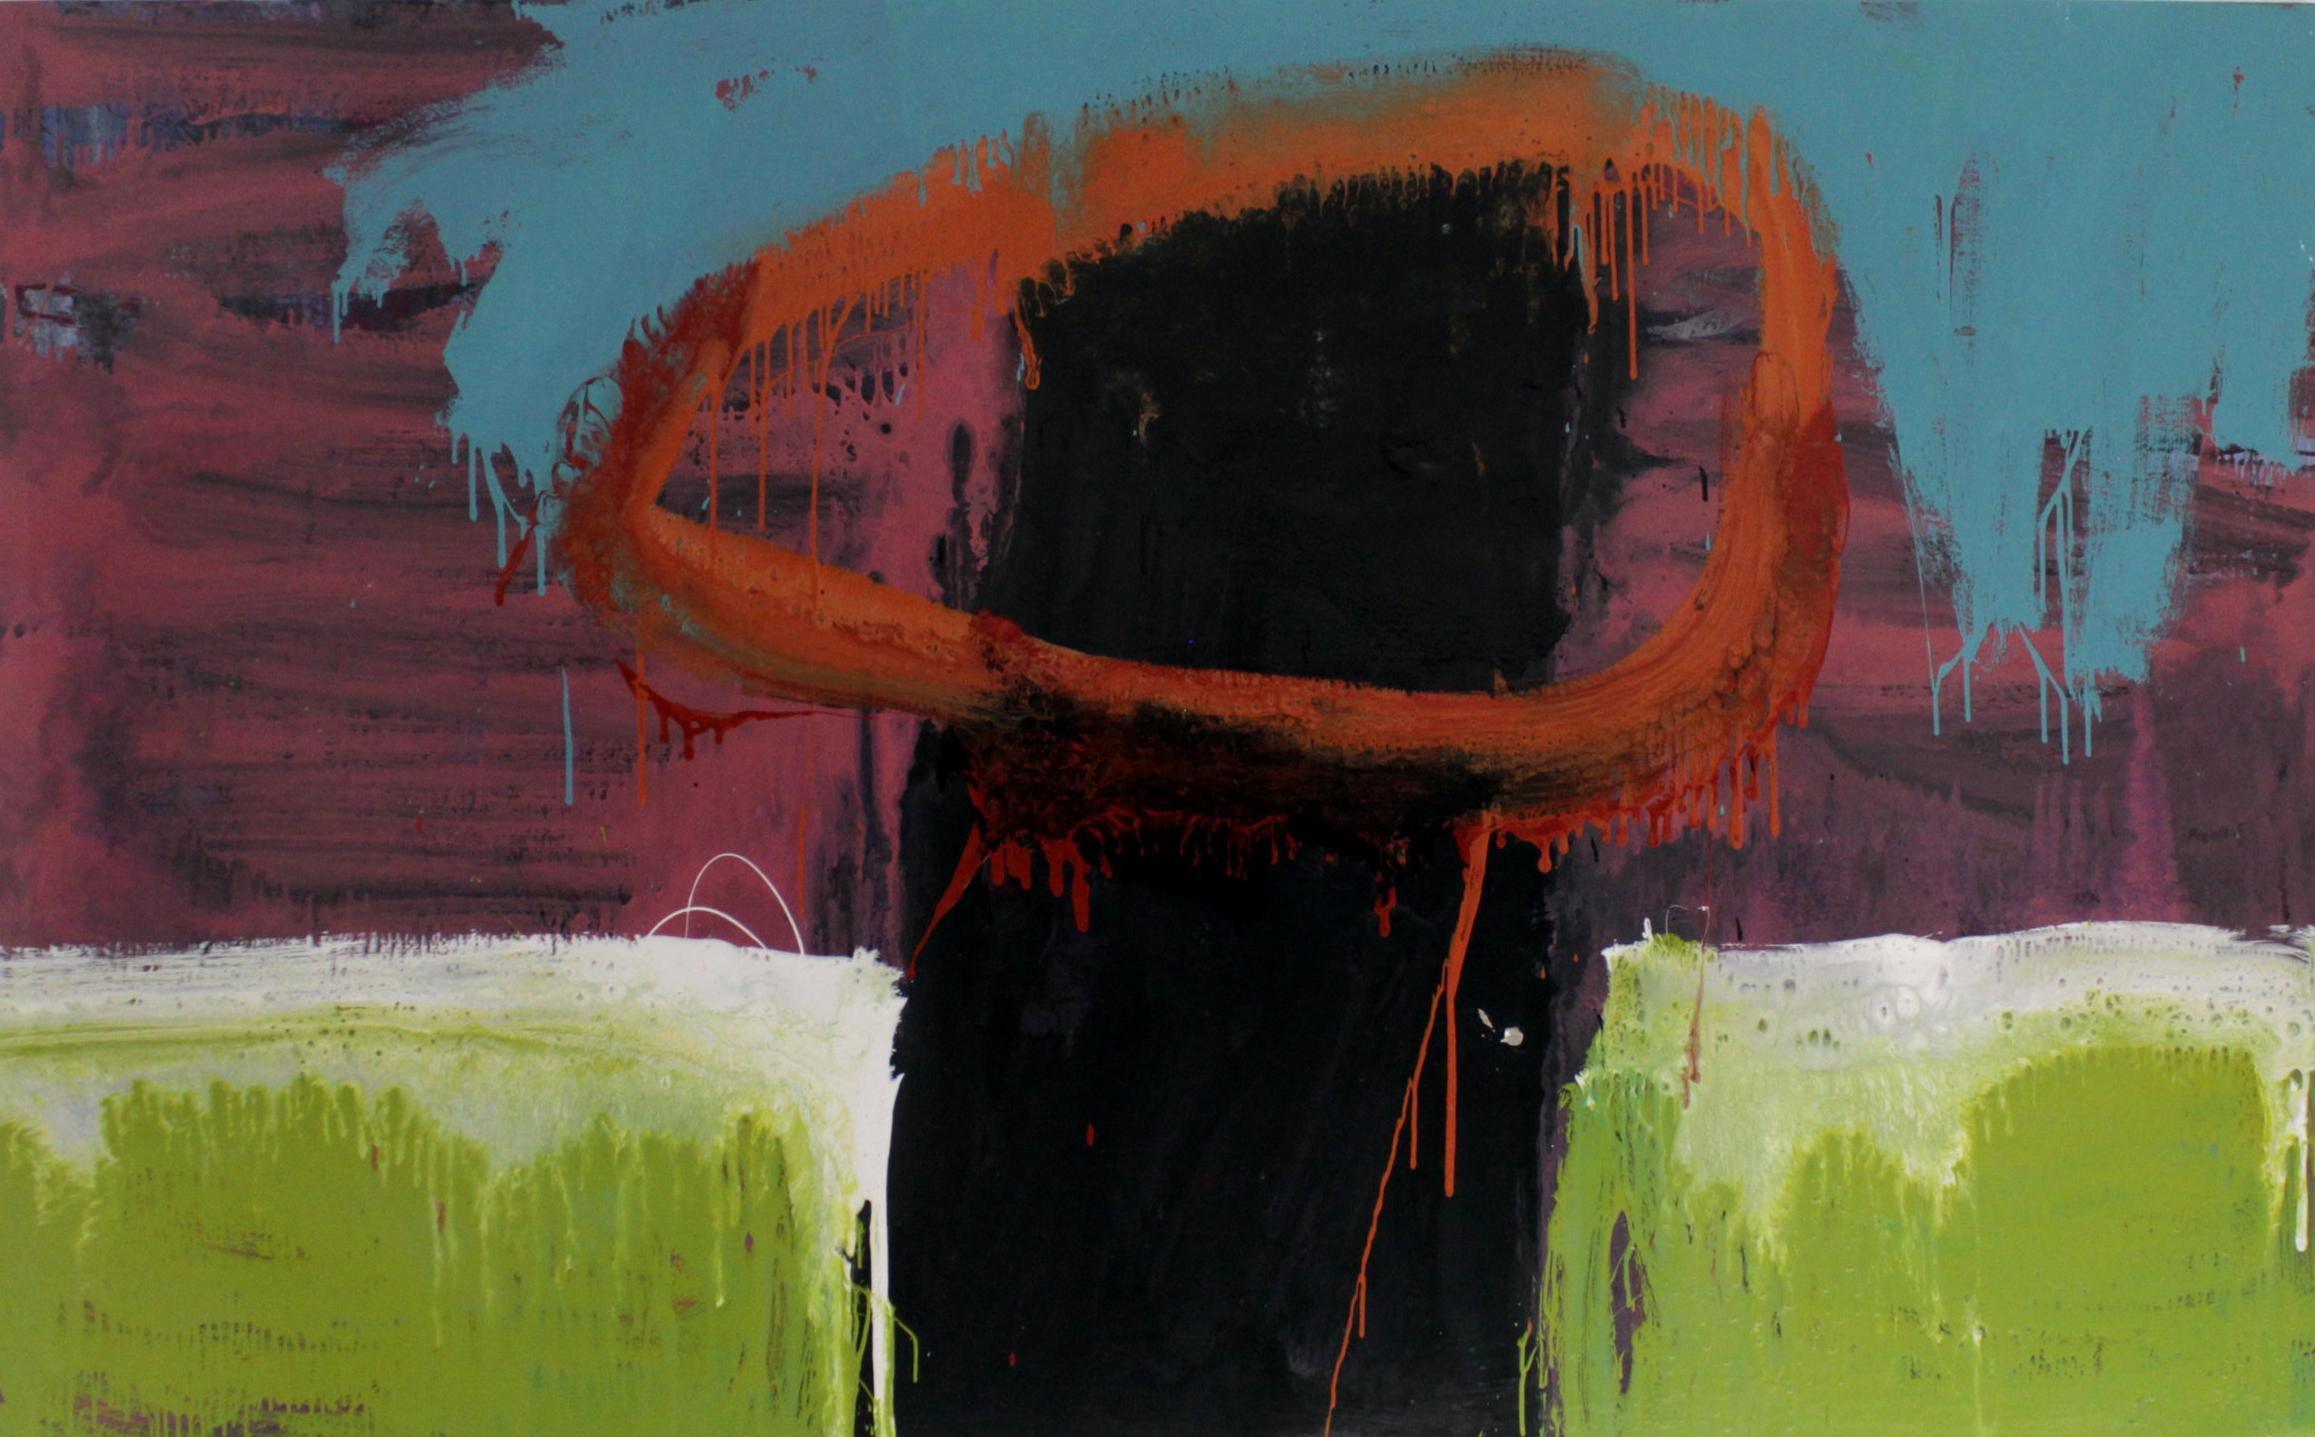 Untitled, 2016, enamel paint on canvas, 152 x 244 cm